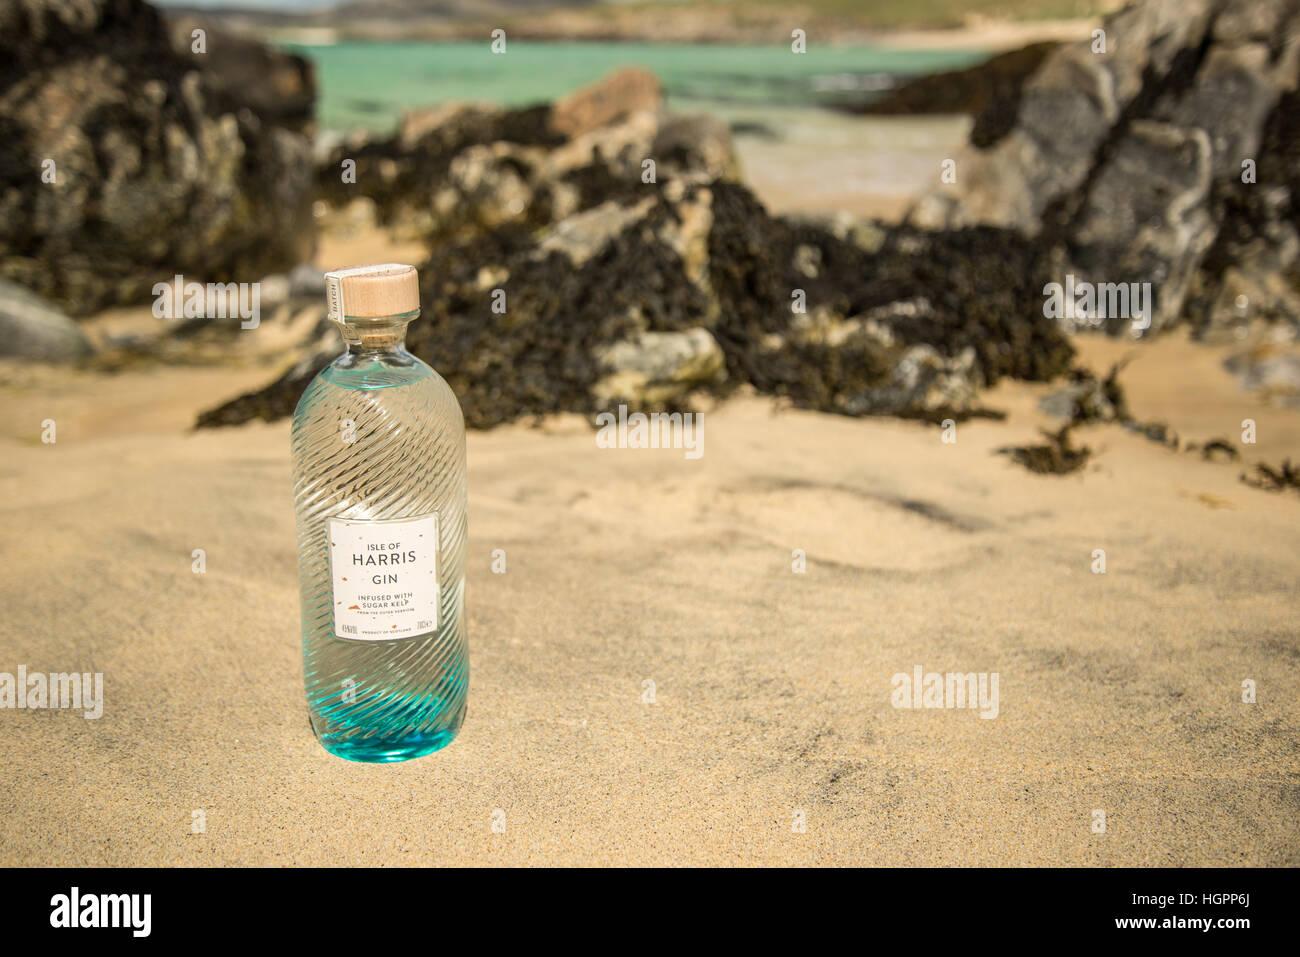 Bottle of Isle of Harris gin on hebridean beach of Traigh Iar, Isle of Harris, Outer Hebrides, scotland. Stock Photo